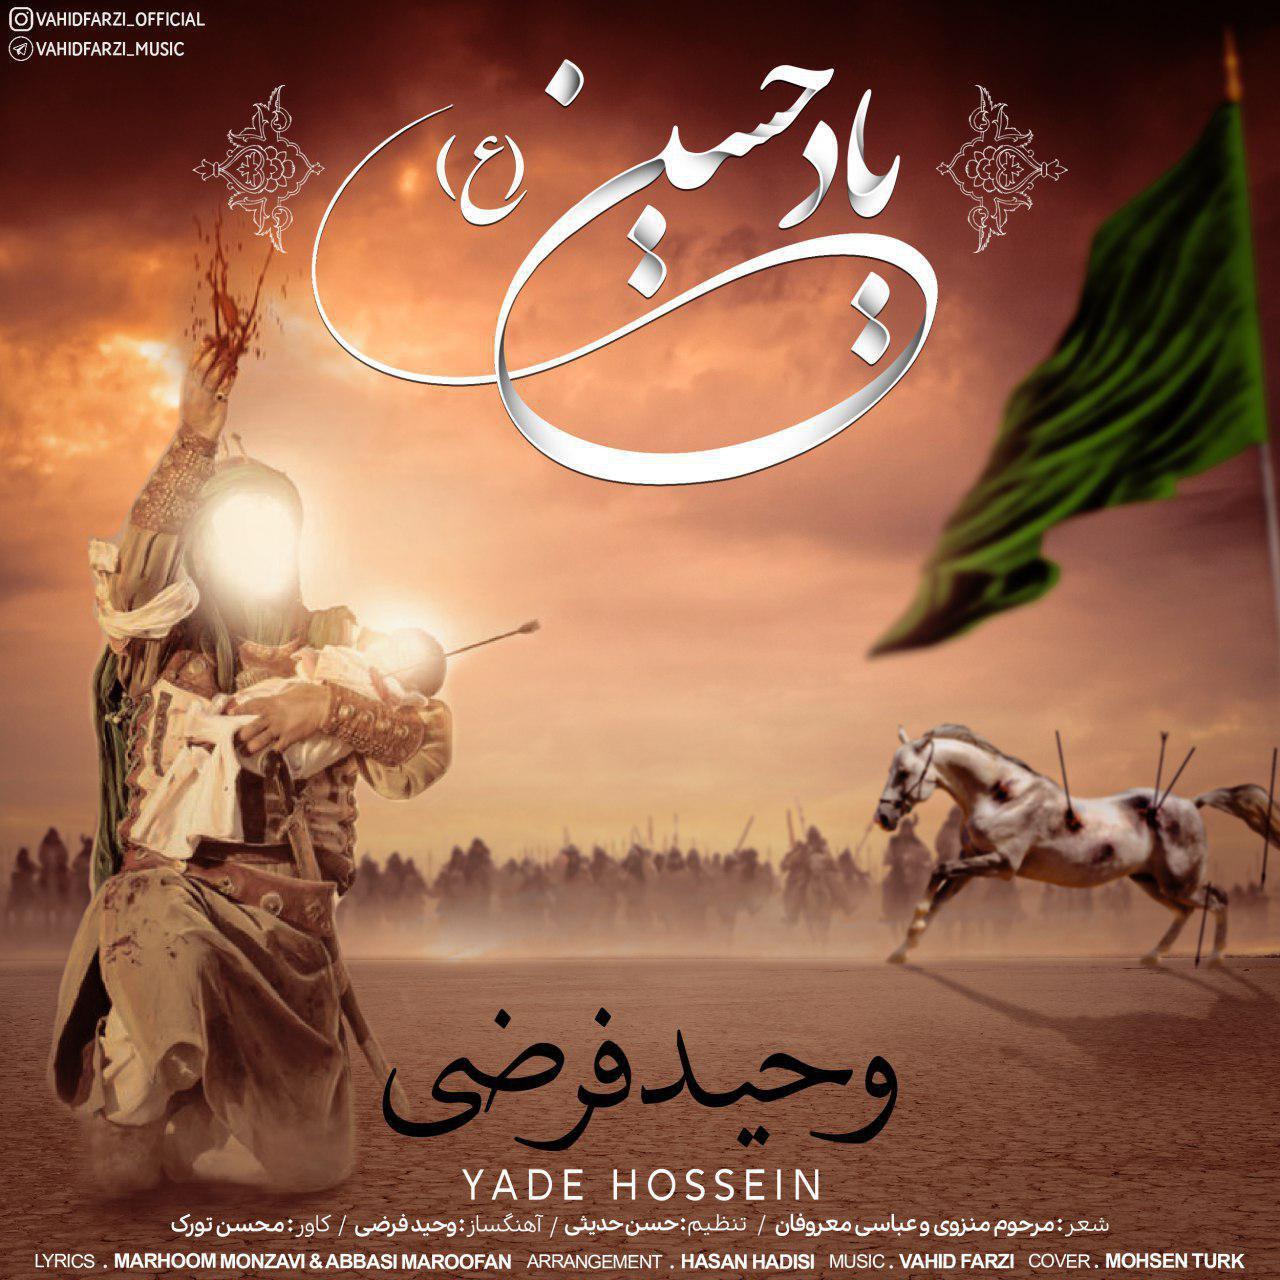 http://s3.picofile.com/file/8372196268/11Vahid_Farzi_Yade_Hossein.jpg